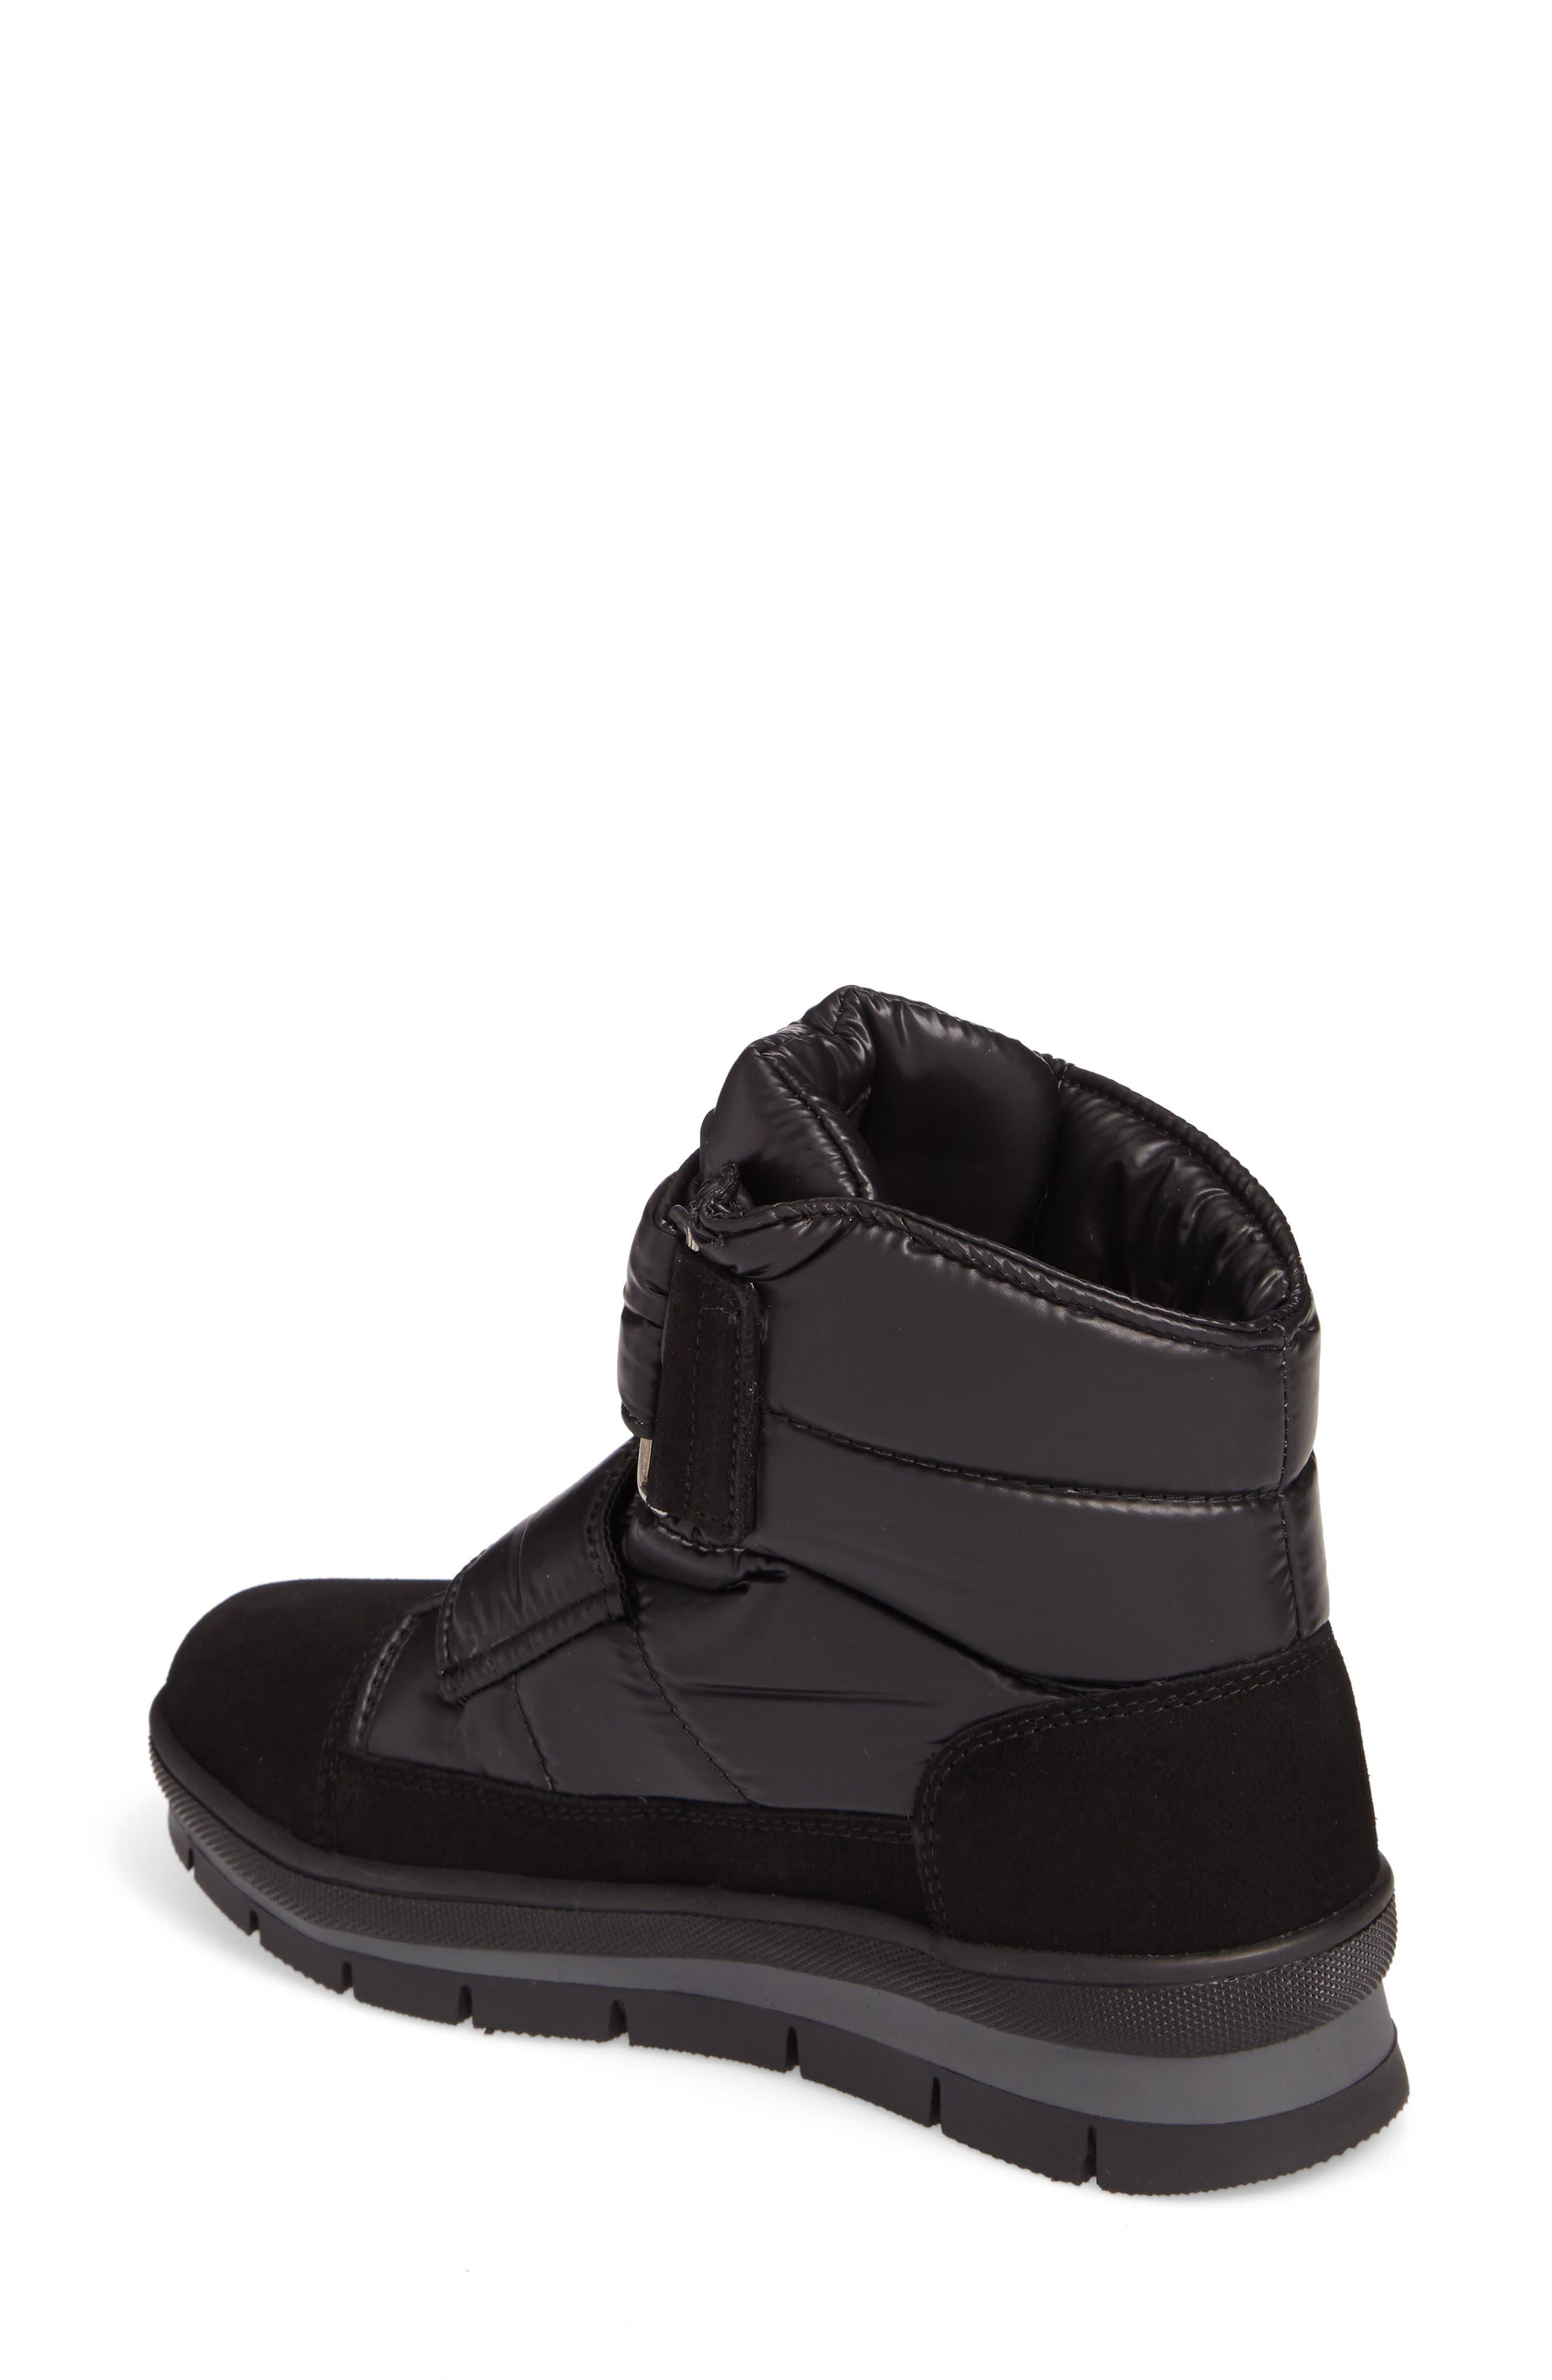 Gran Sasso Waterproof Boot,                             Alternate thumbnail 2, color,                             Black Baltico